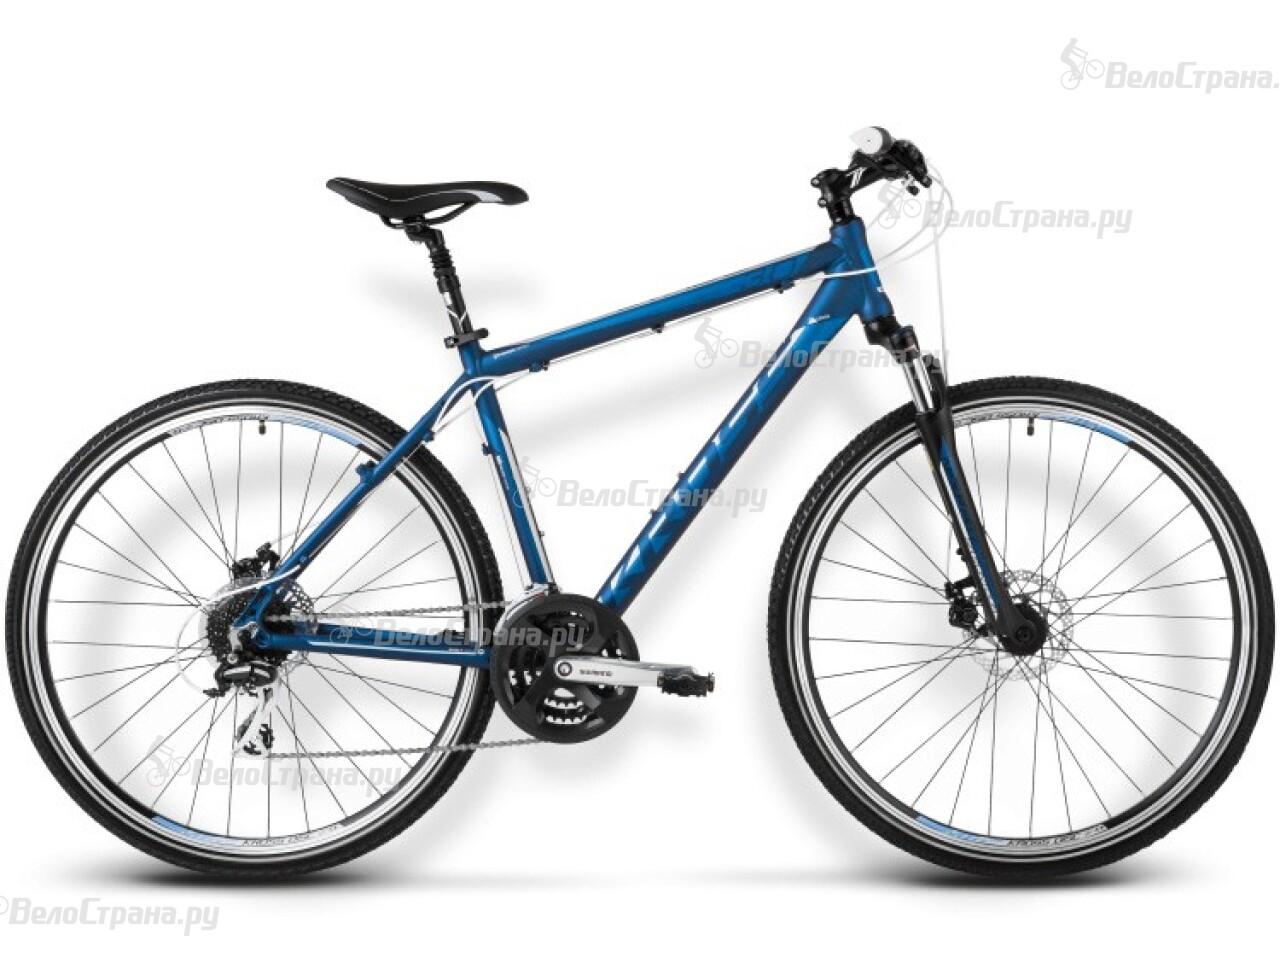 Велосипед Kross EVADO 3.0 (2016) велосипед kross evado 6 0 2016